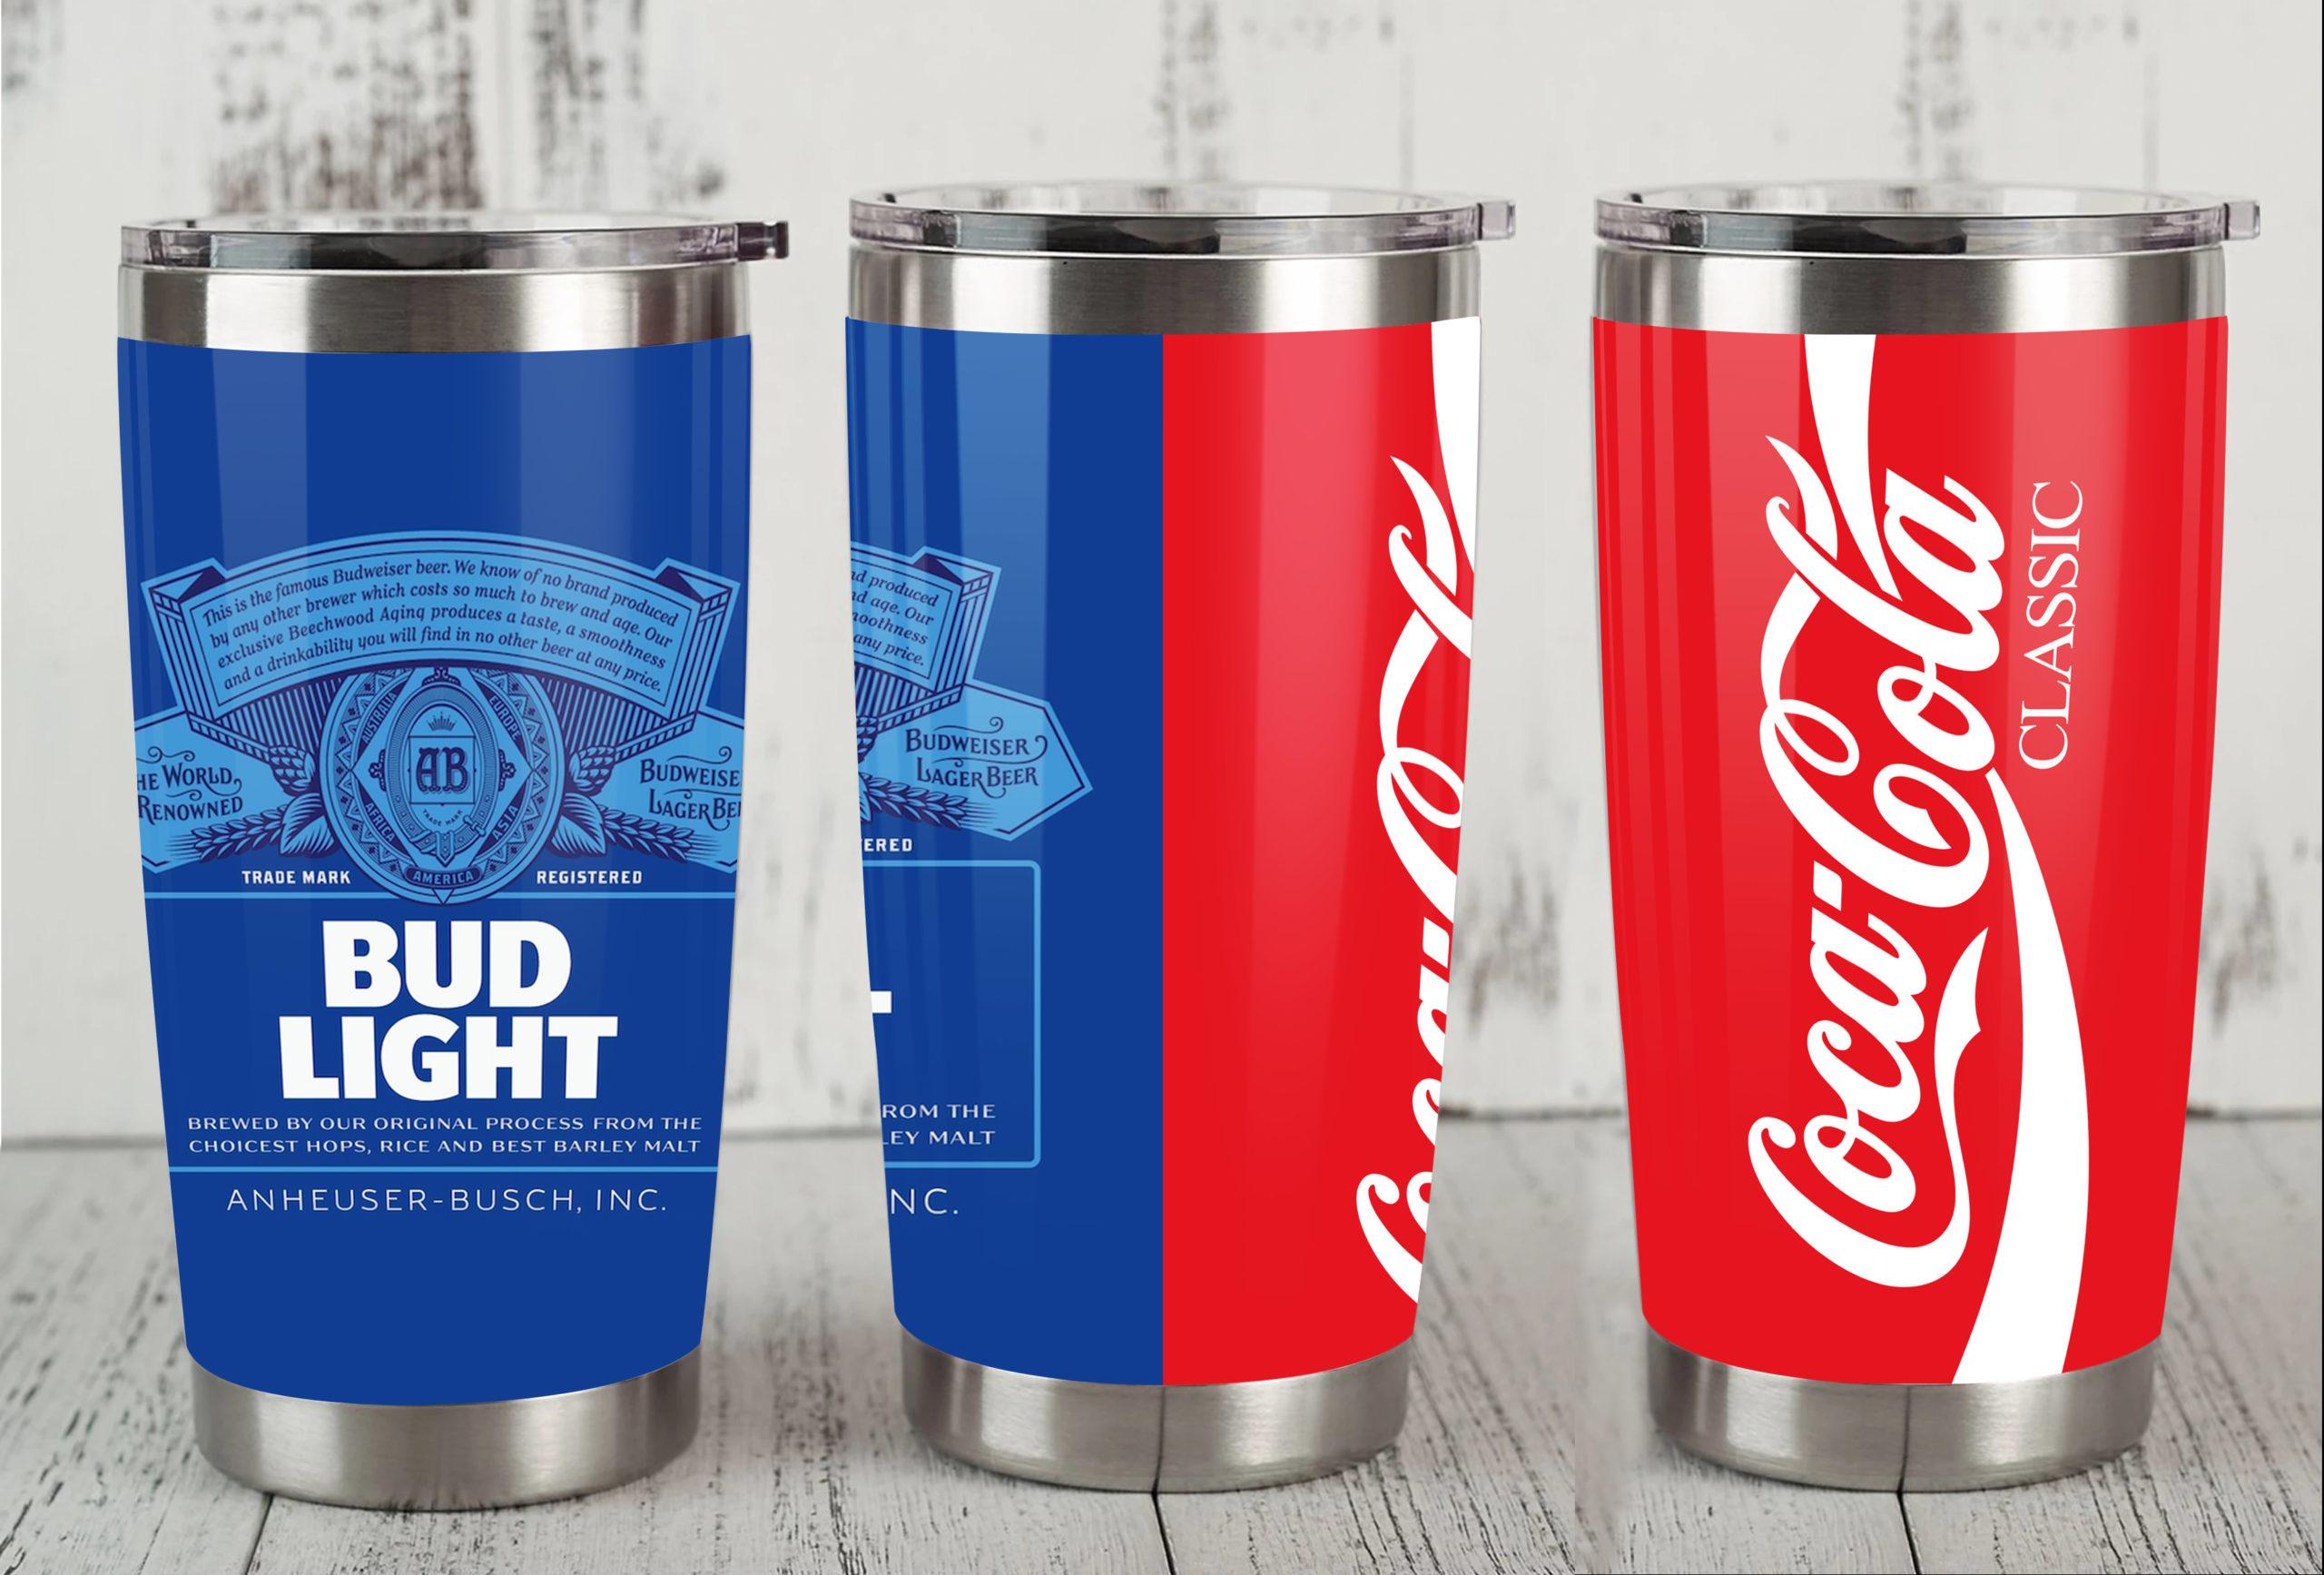 Bud light coca cola all over print tumbler 2